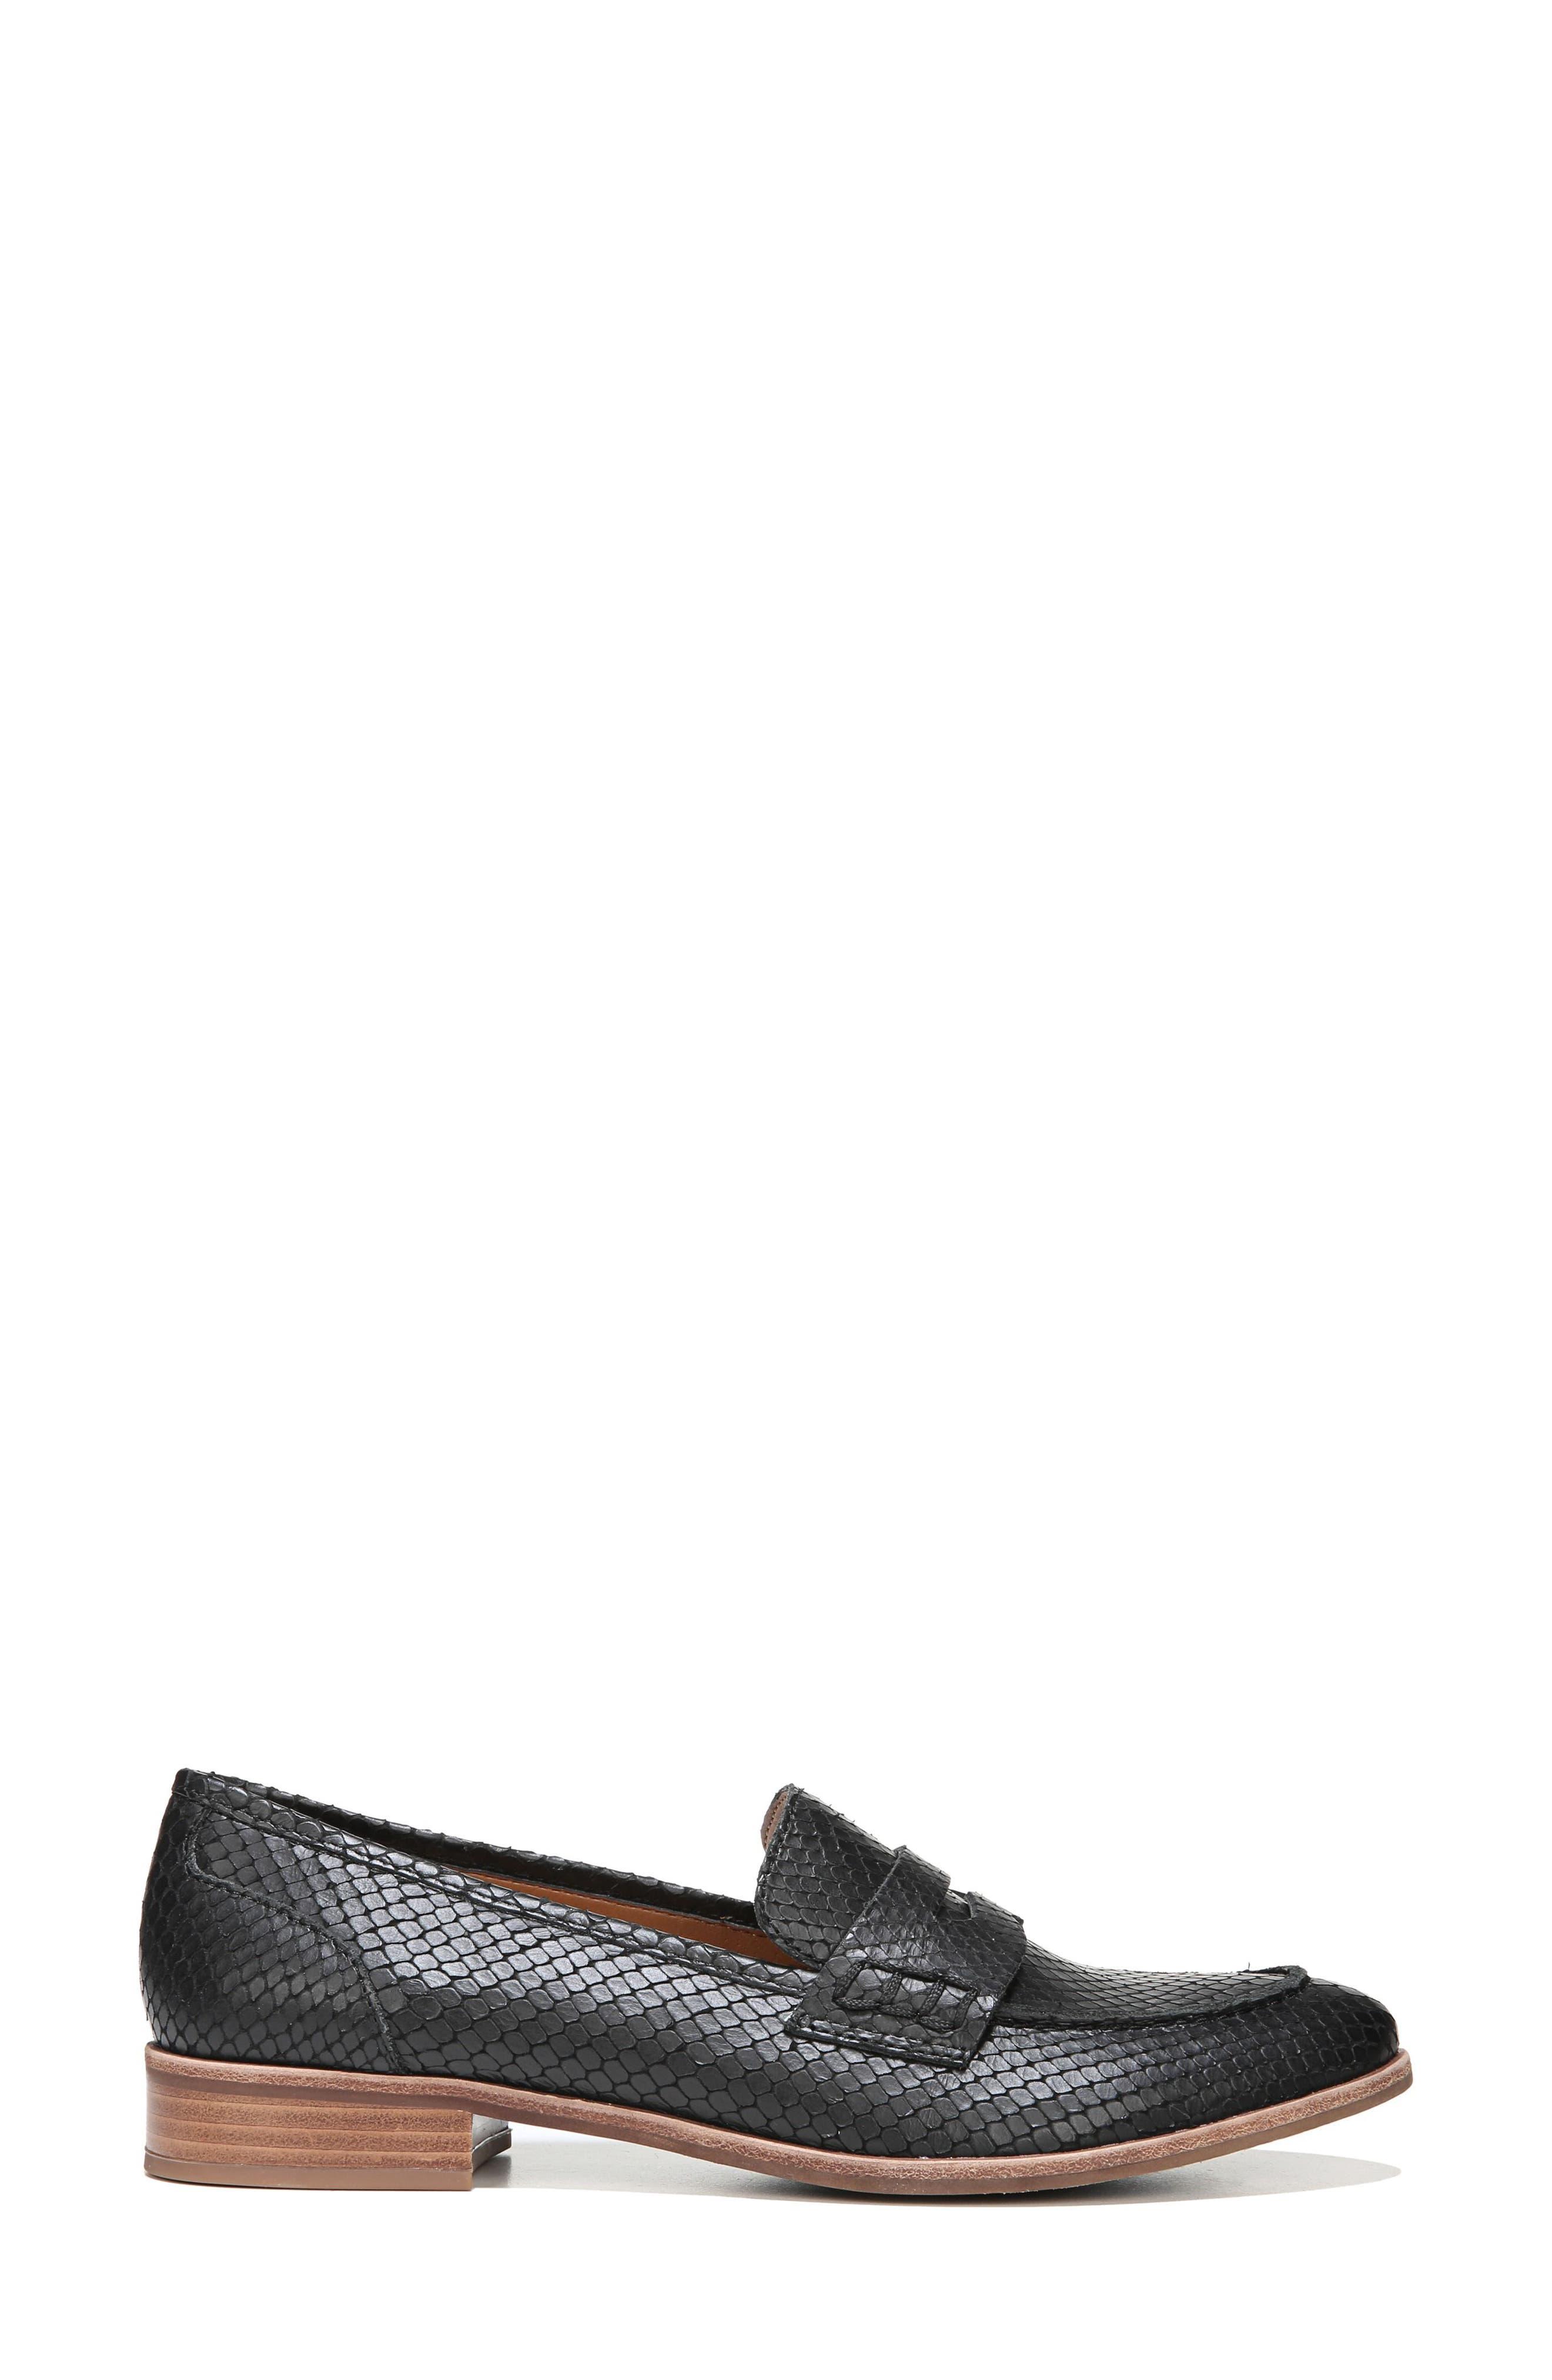 'Jolette' Penny Loafer,                             Alternate thumbnail 3, color,                             Black Printed Leather